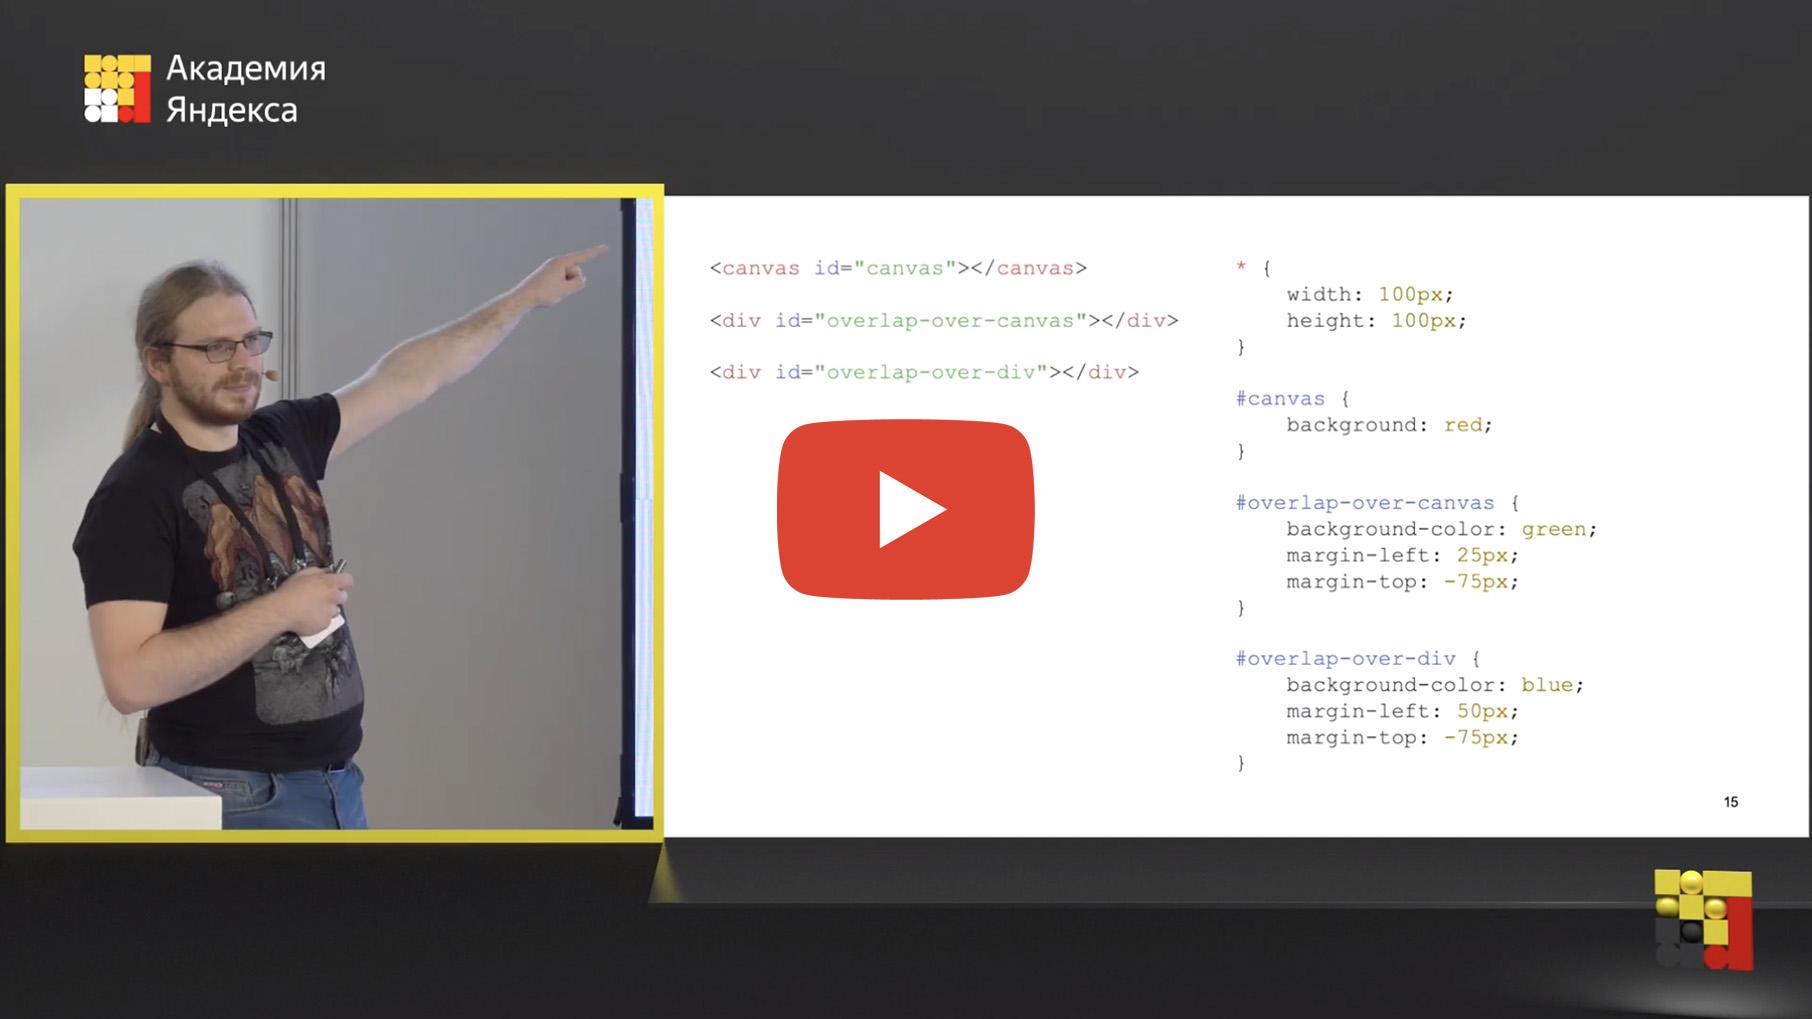 Как рисует браузер. Лекция Яндекса